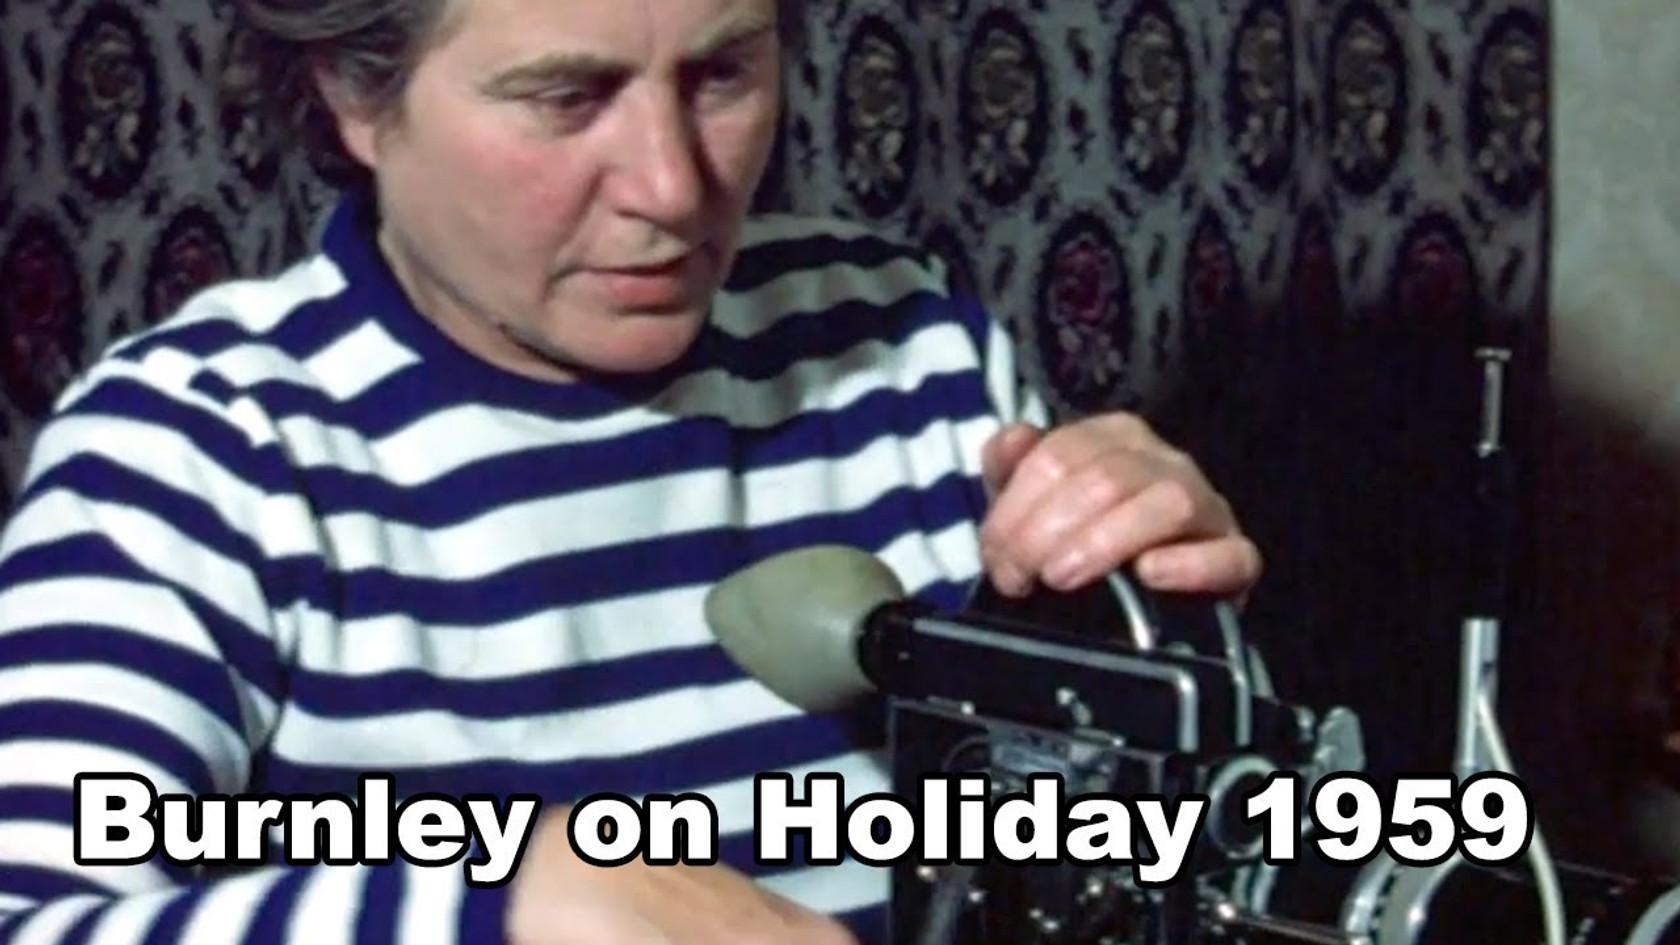 Burnley on Holiday 1959